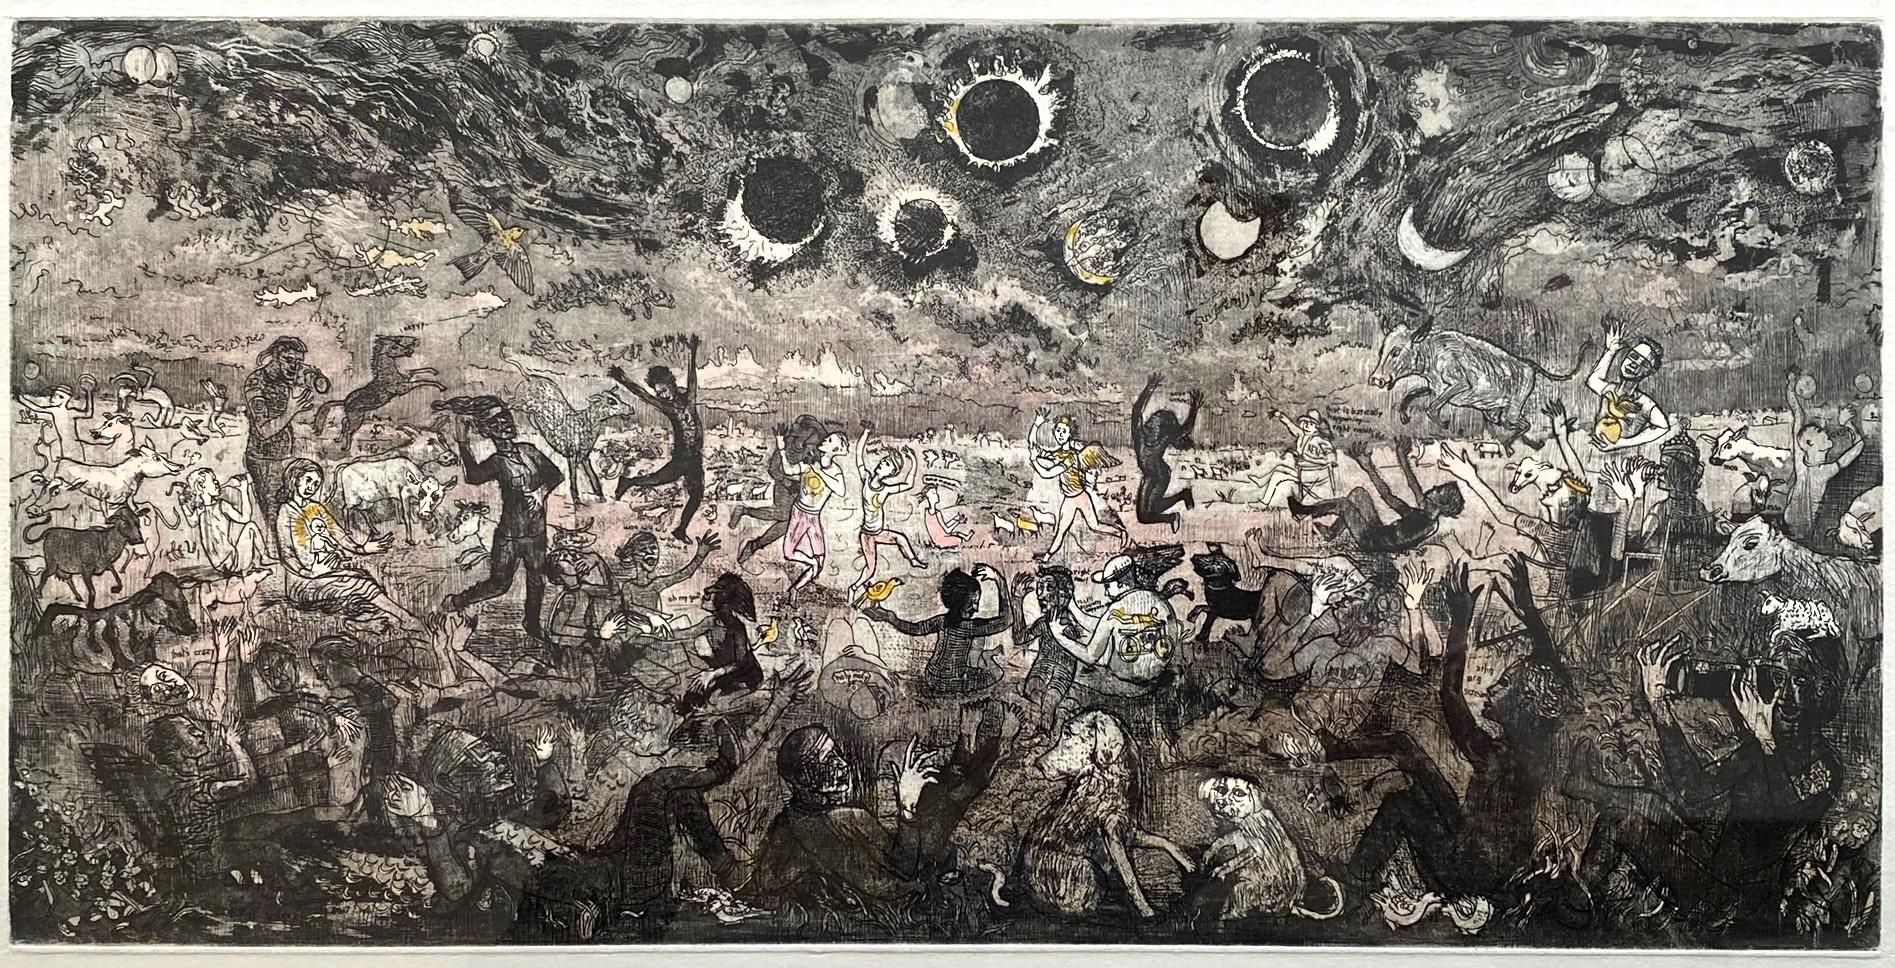 "<span class=""link fancybox-details-link""><a href=""/exhibitions/20/works/artworks_standalone10721/"">View Detail Page</a></span><div class=""artist""><span class=""artist""><strong>James Boyd Brent RE</strong></span></div><div class=""title""><em>Adoration (solar eclipse)</em></div><div class=""medium"">intaglio and mono print<br></div><div class=""dimensions"">20 x 40 cm image size</div><div class=""edition_details"">edition of 25</div>"